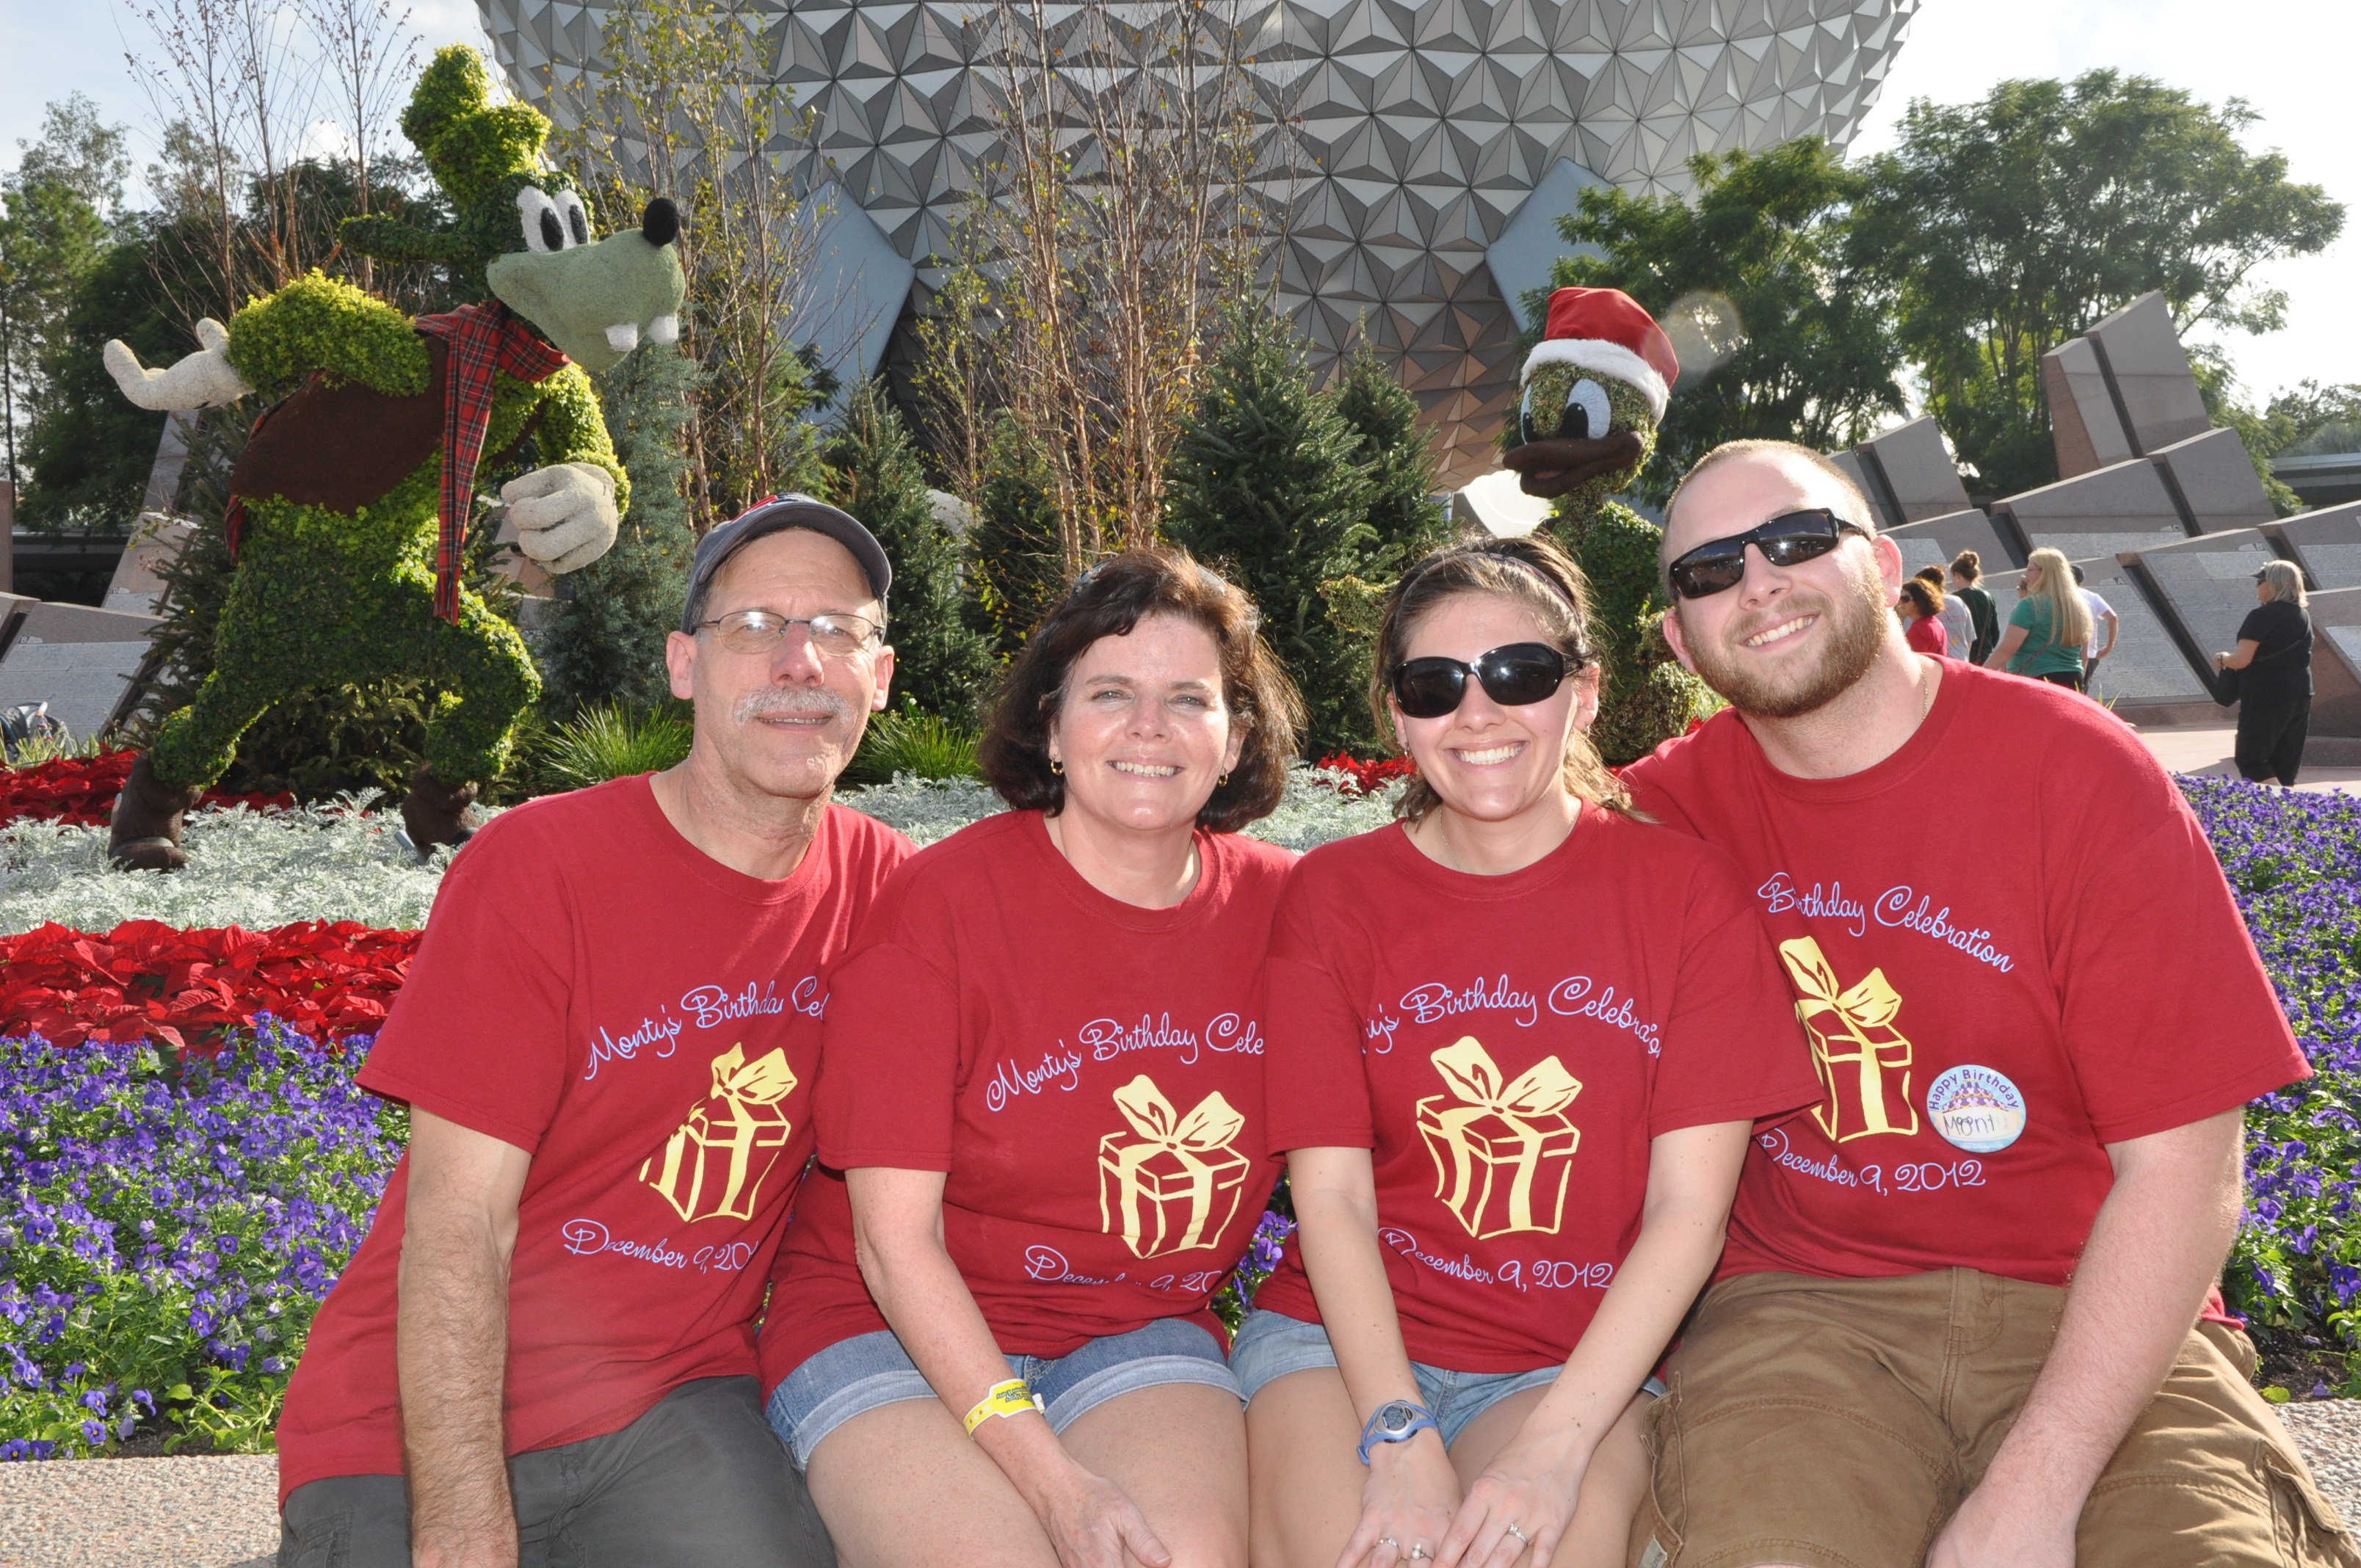 Birthday In Disney T Shirt Photo